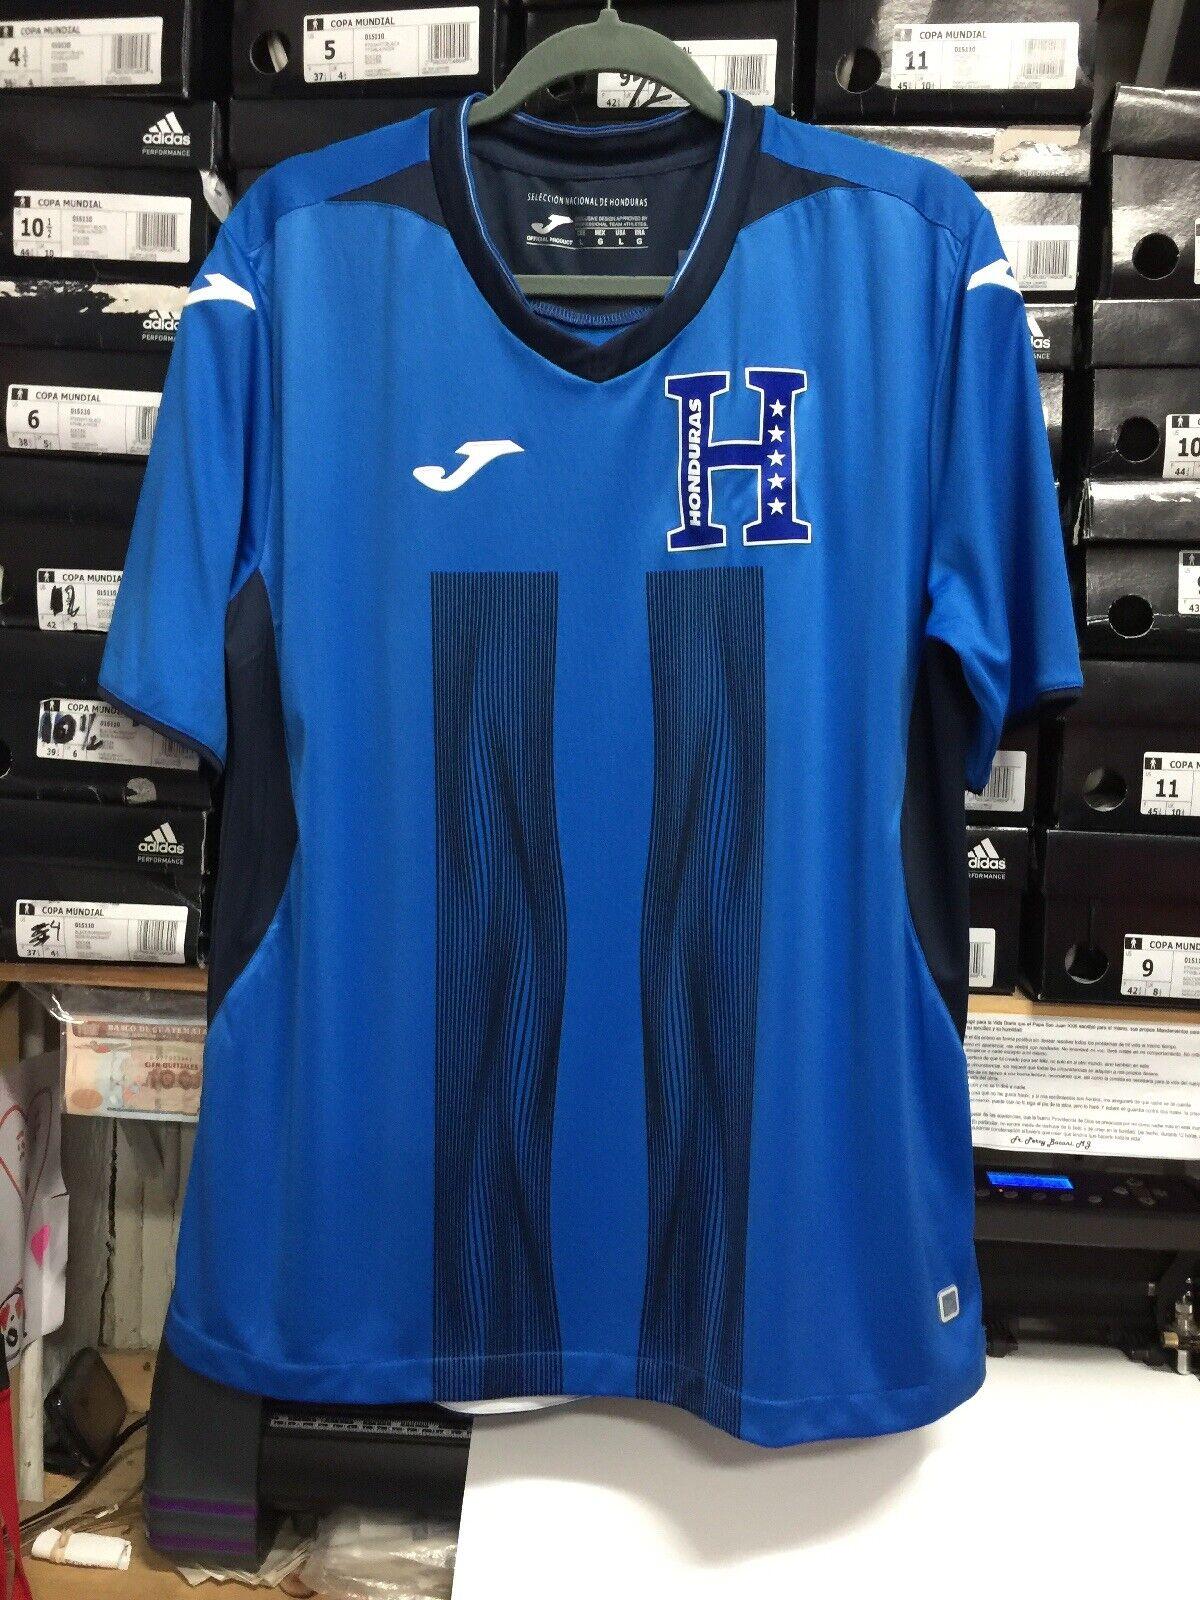 Joma Honduras Third Jersey 2019 Camiseta De Honduras Alternativa Diuominiione XXL Only